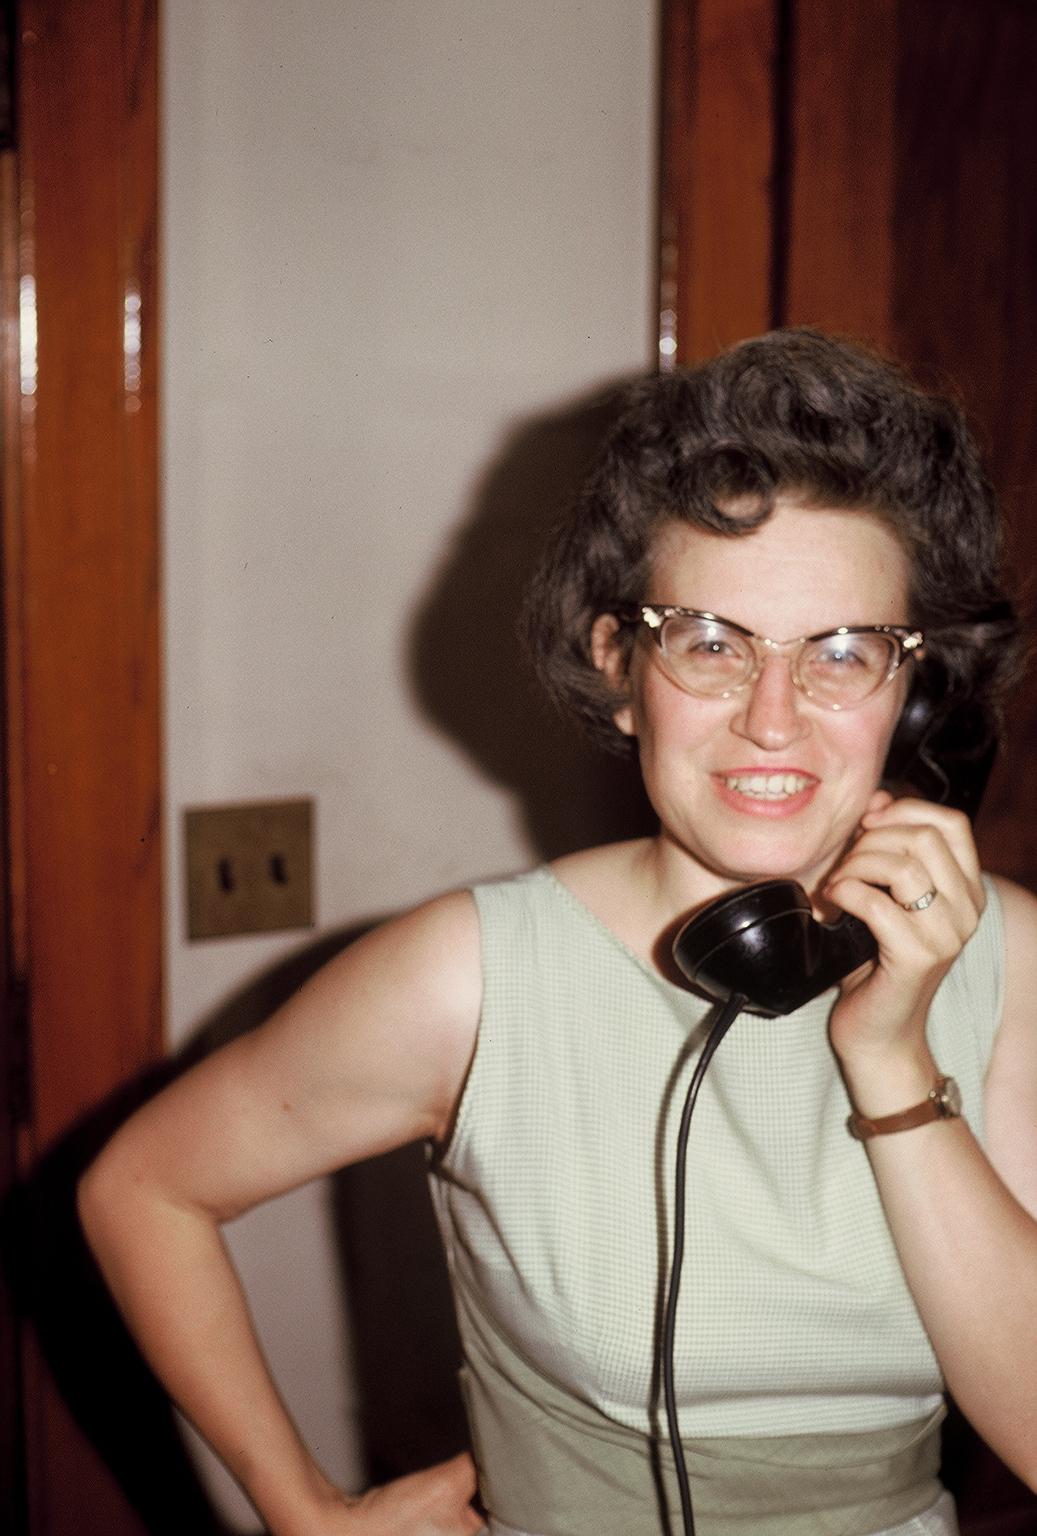 Jane on the phone